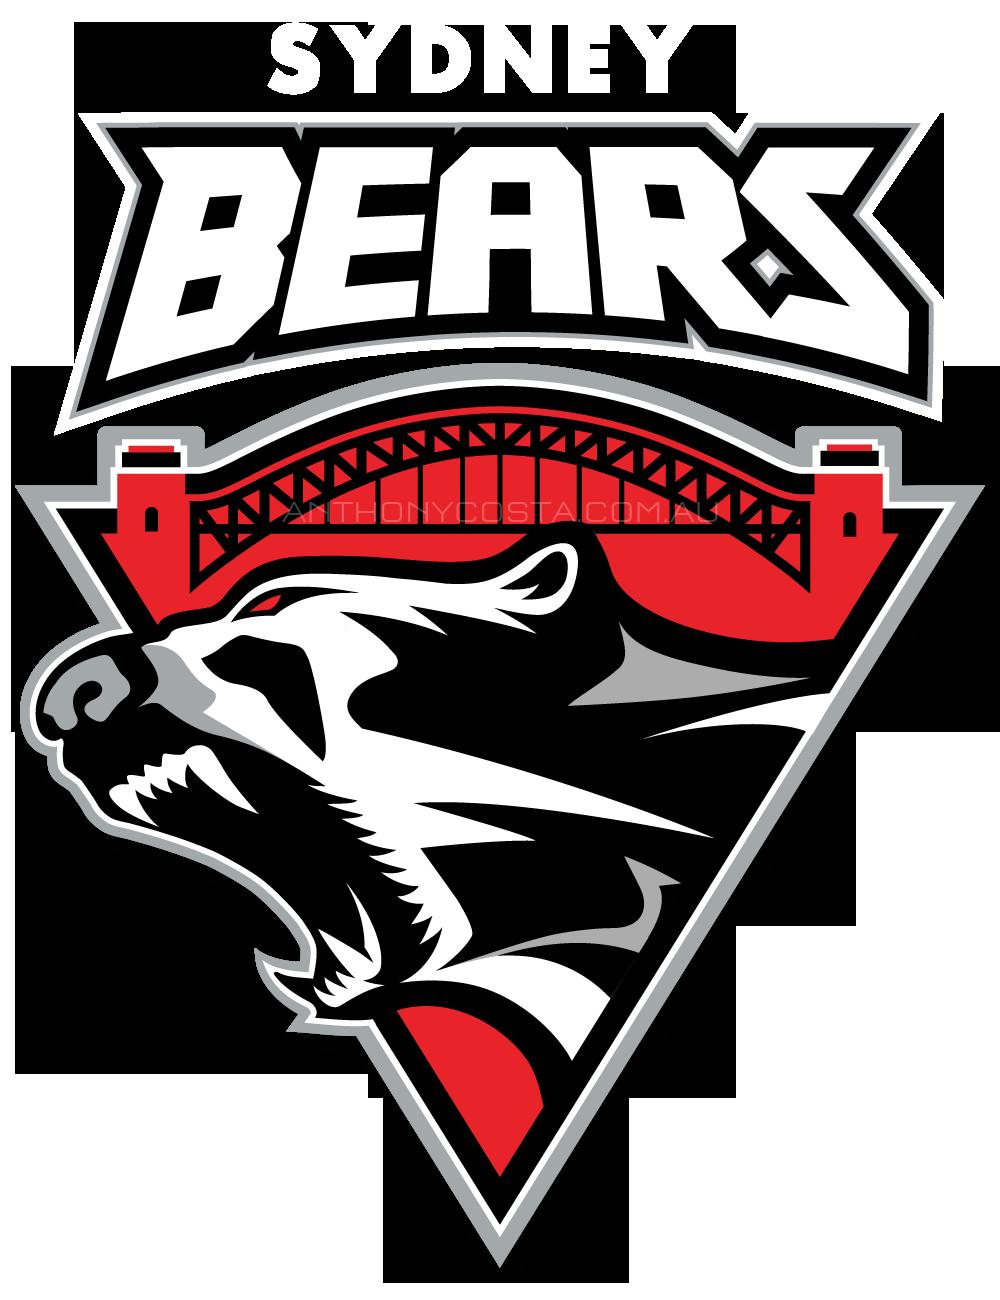 Sydney Bears sports logo design